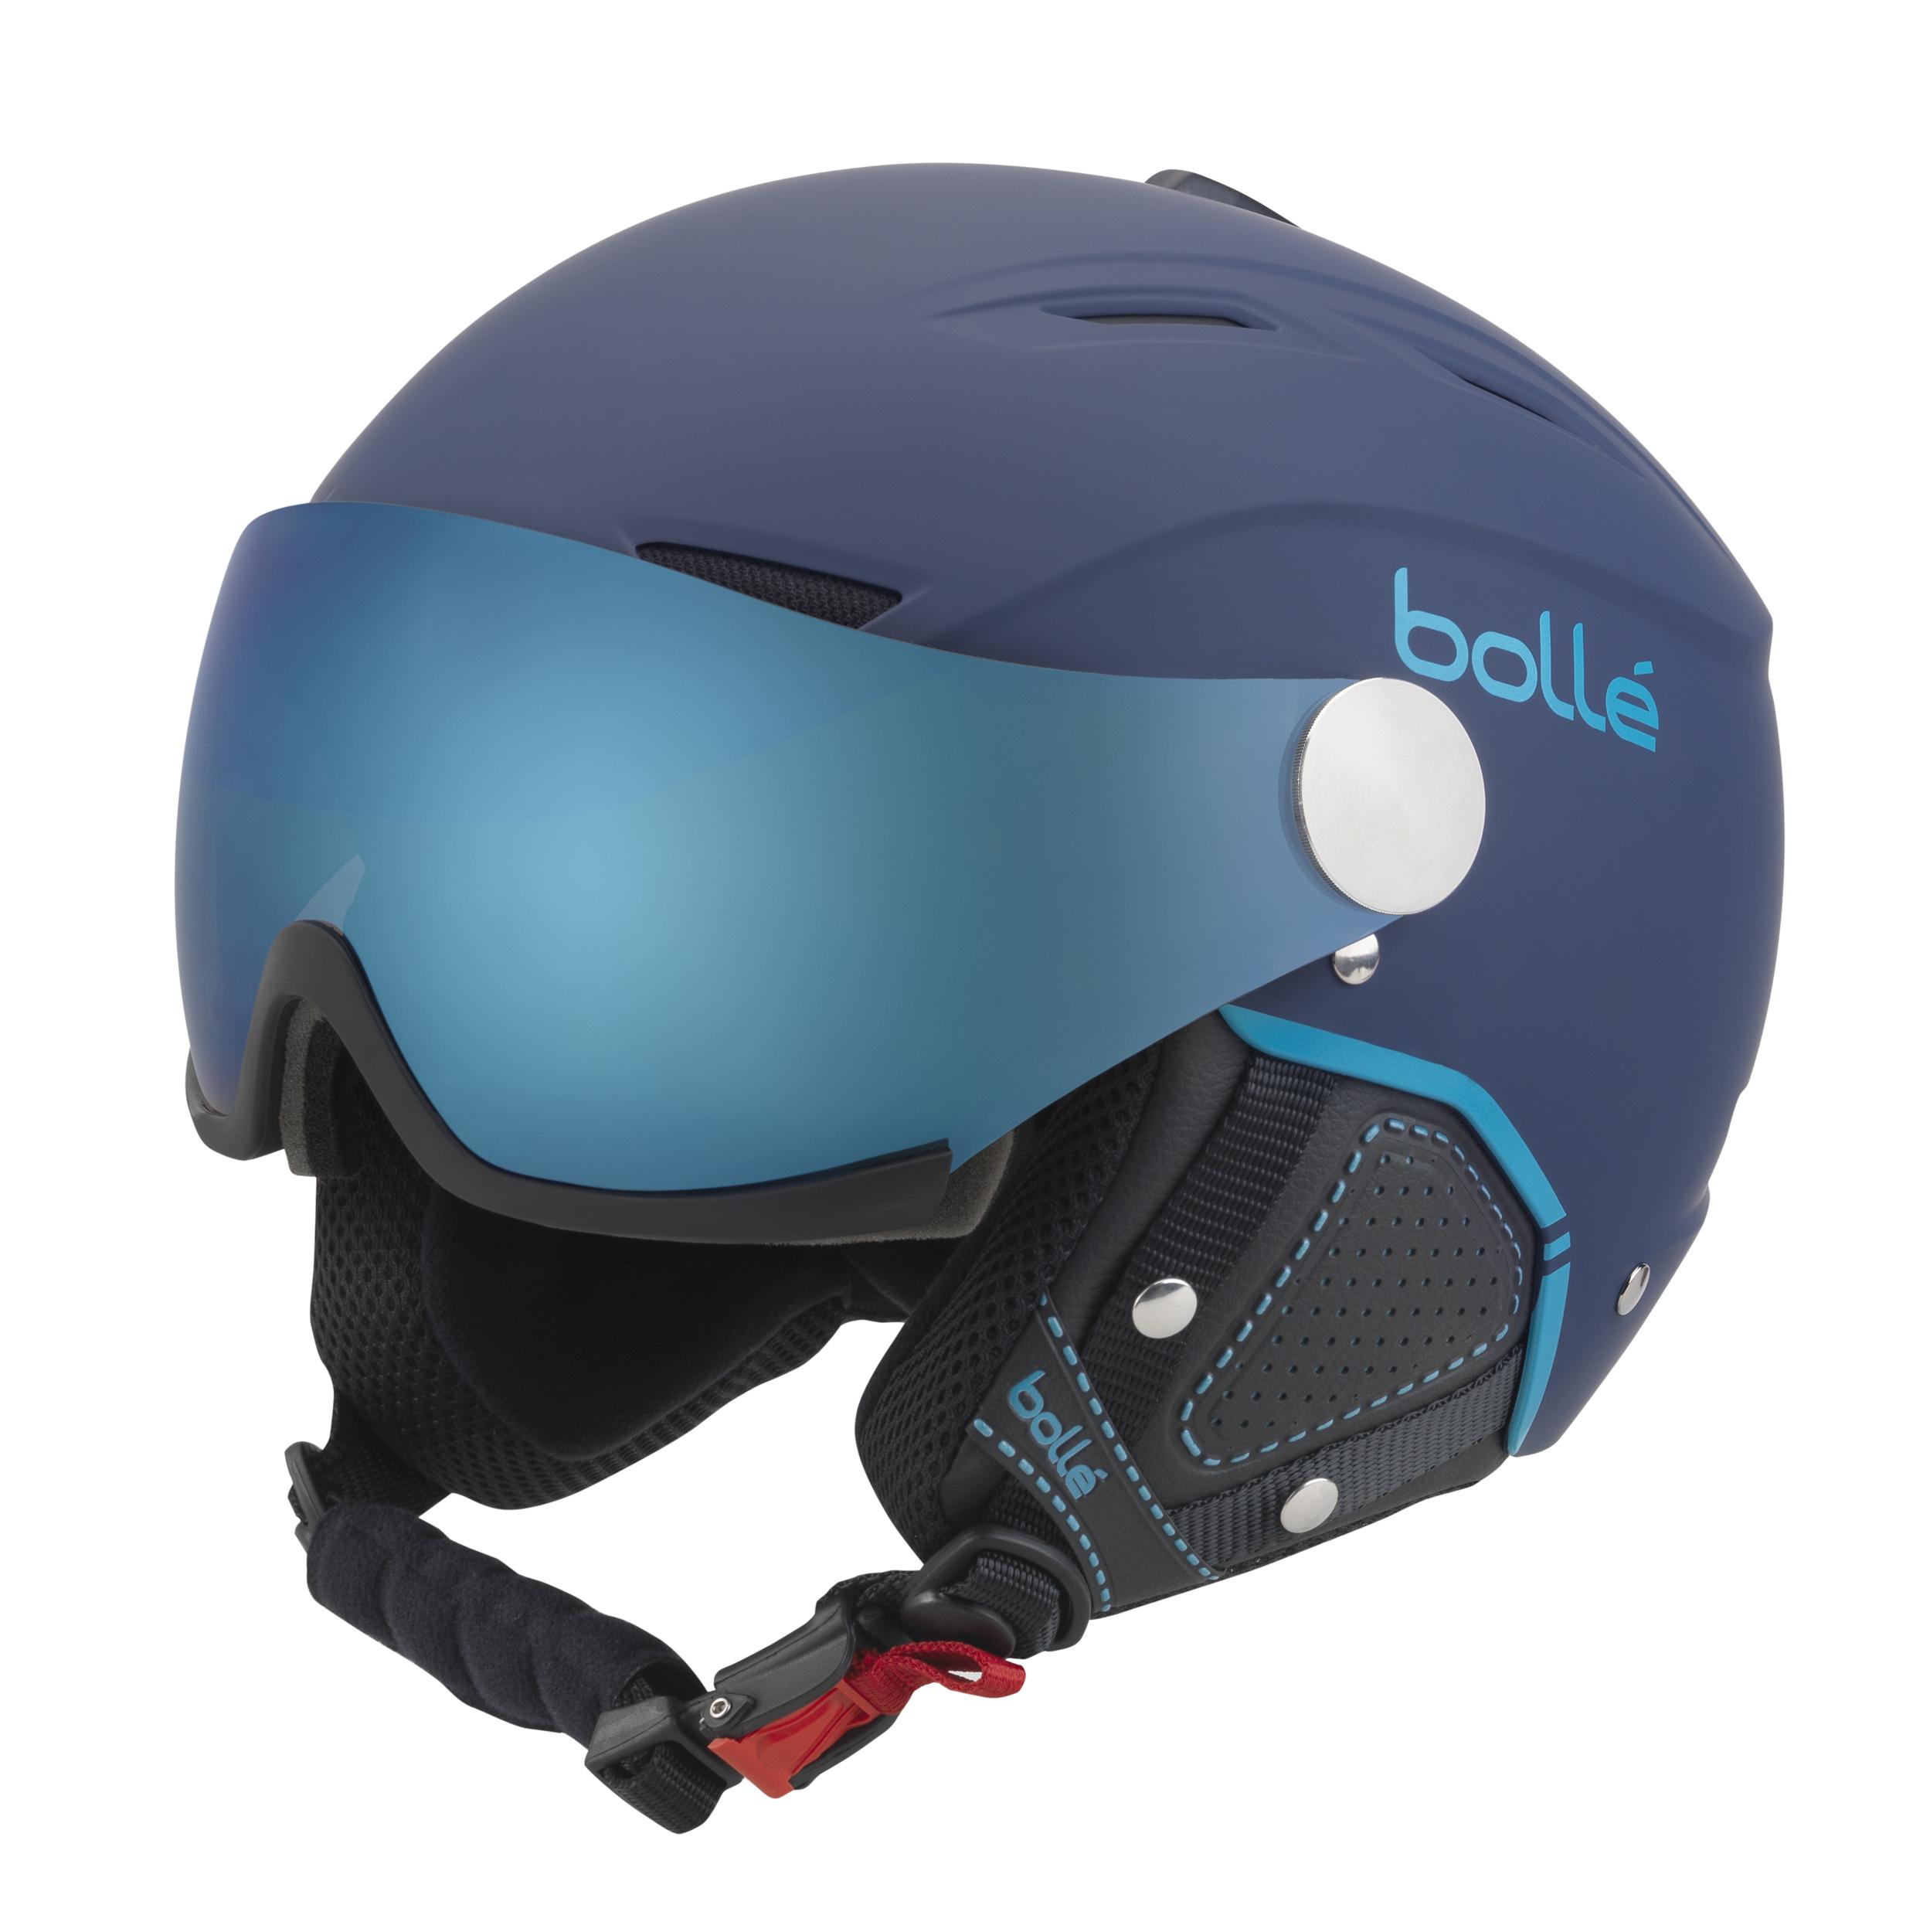 Casque De Ski Visiere Bolle Blackline Visor Premium Casque De Ski